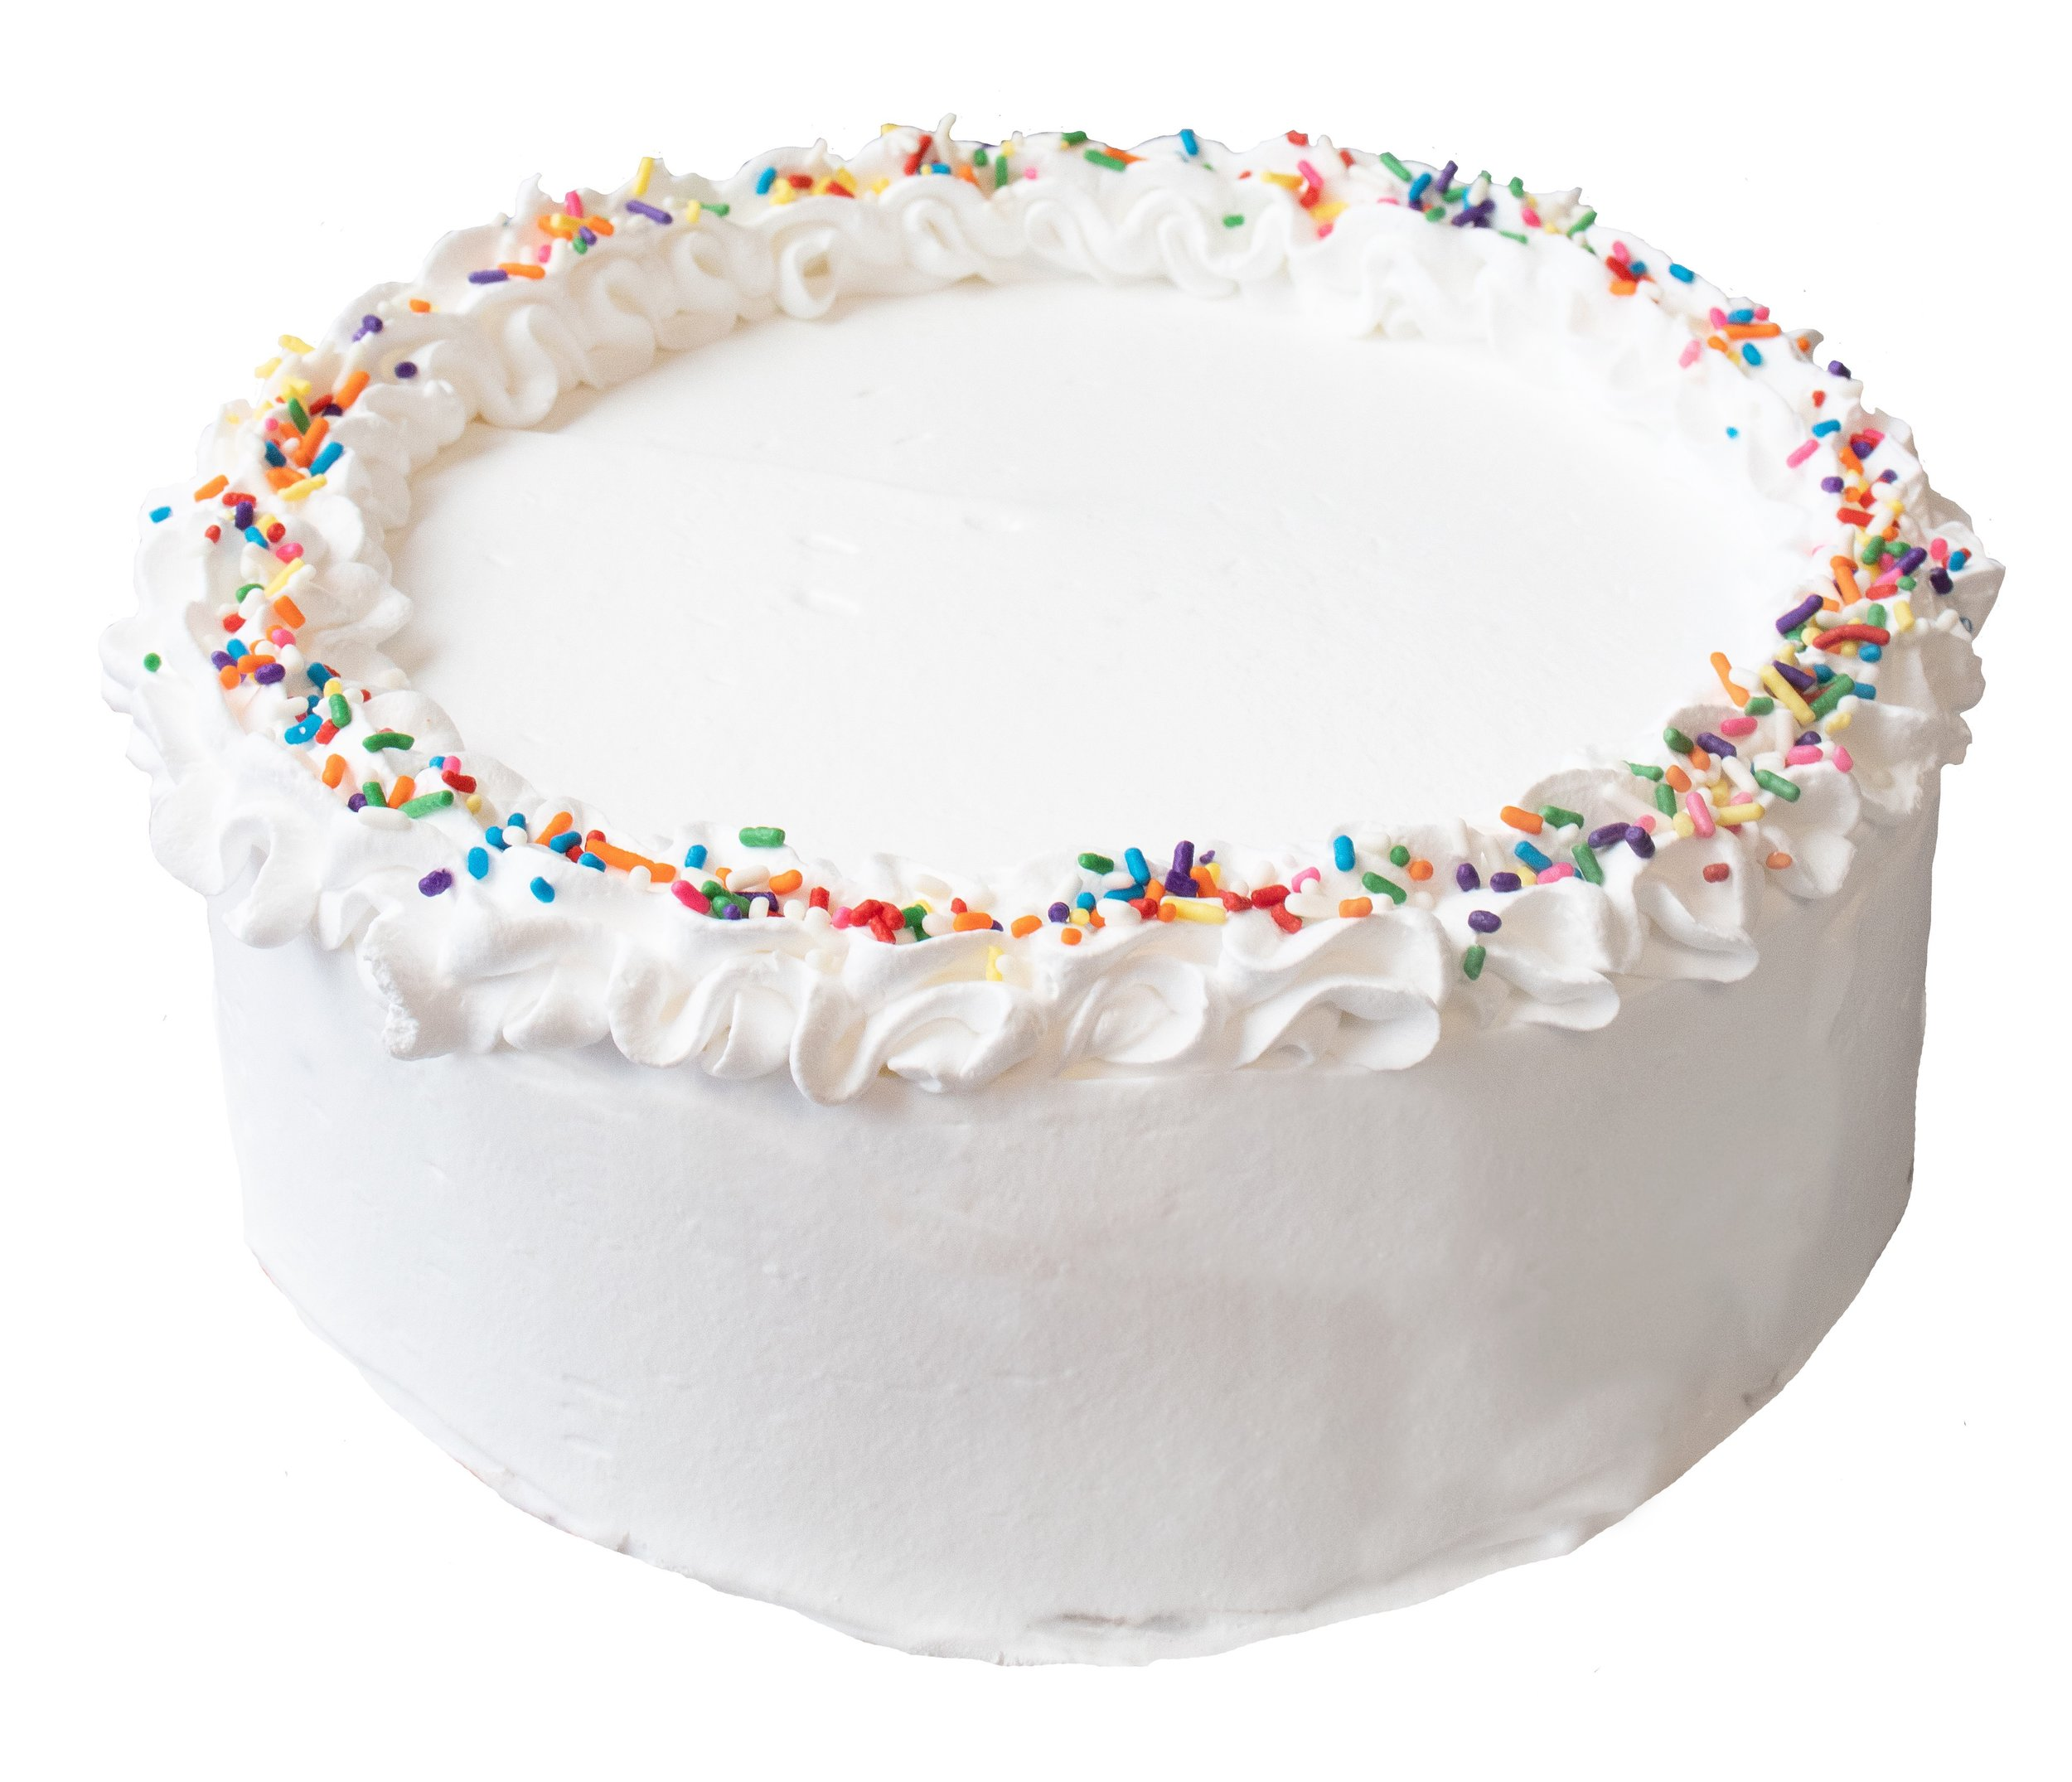 Skipper Dipper Ice Cream Cakes 2018.jpg